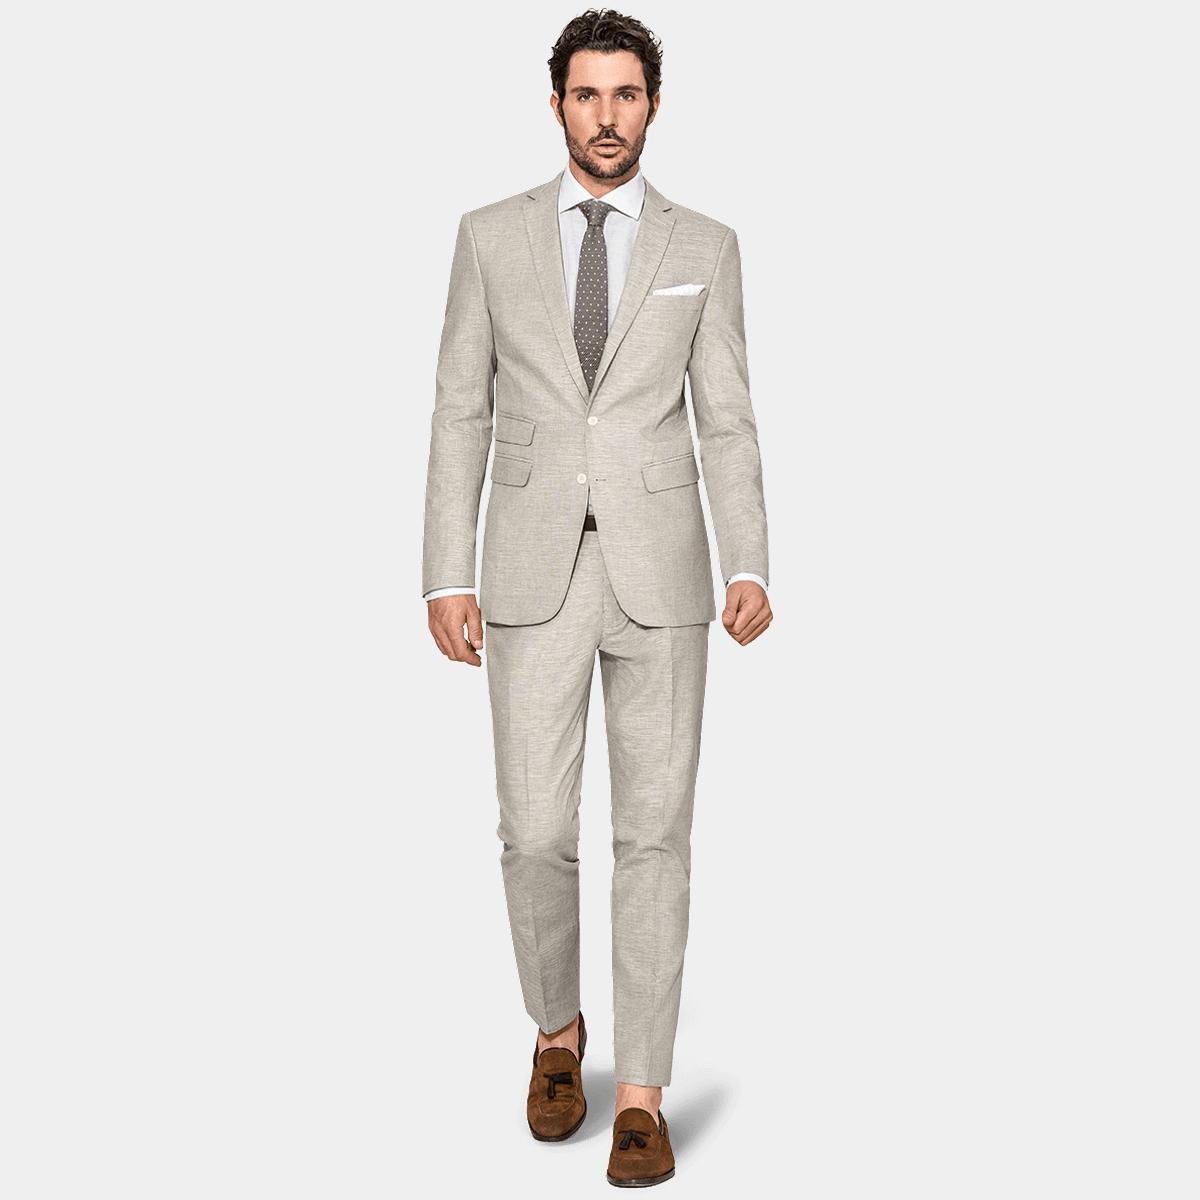 Mens Linen Suits High Quality Linen Fabrics Hockerty